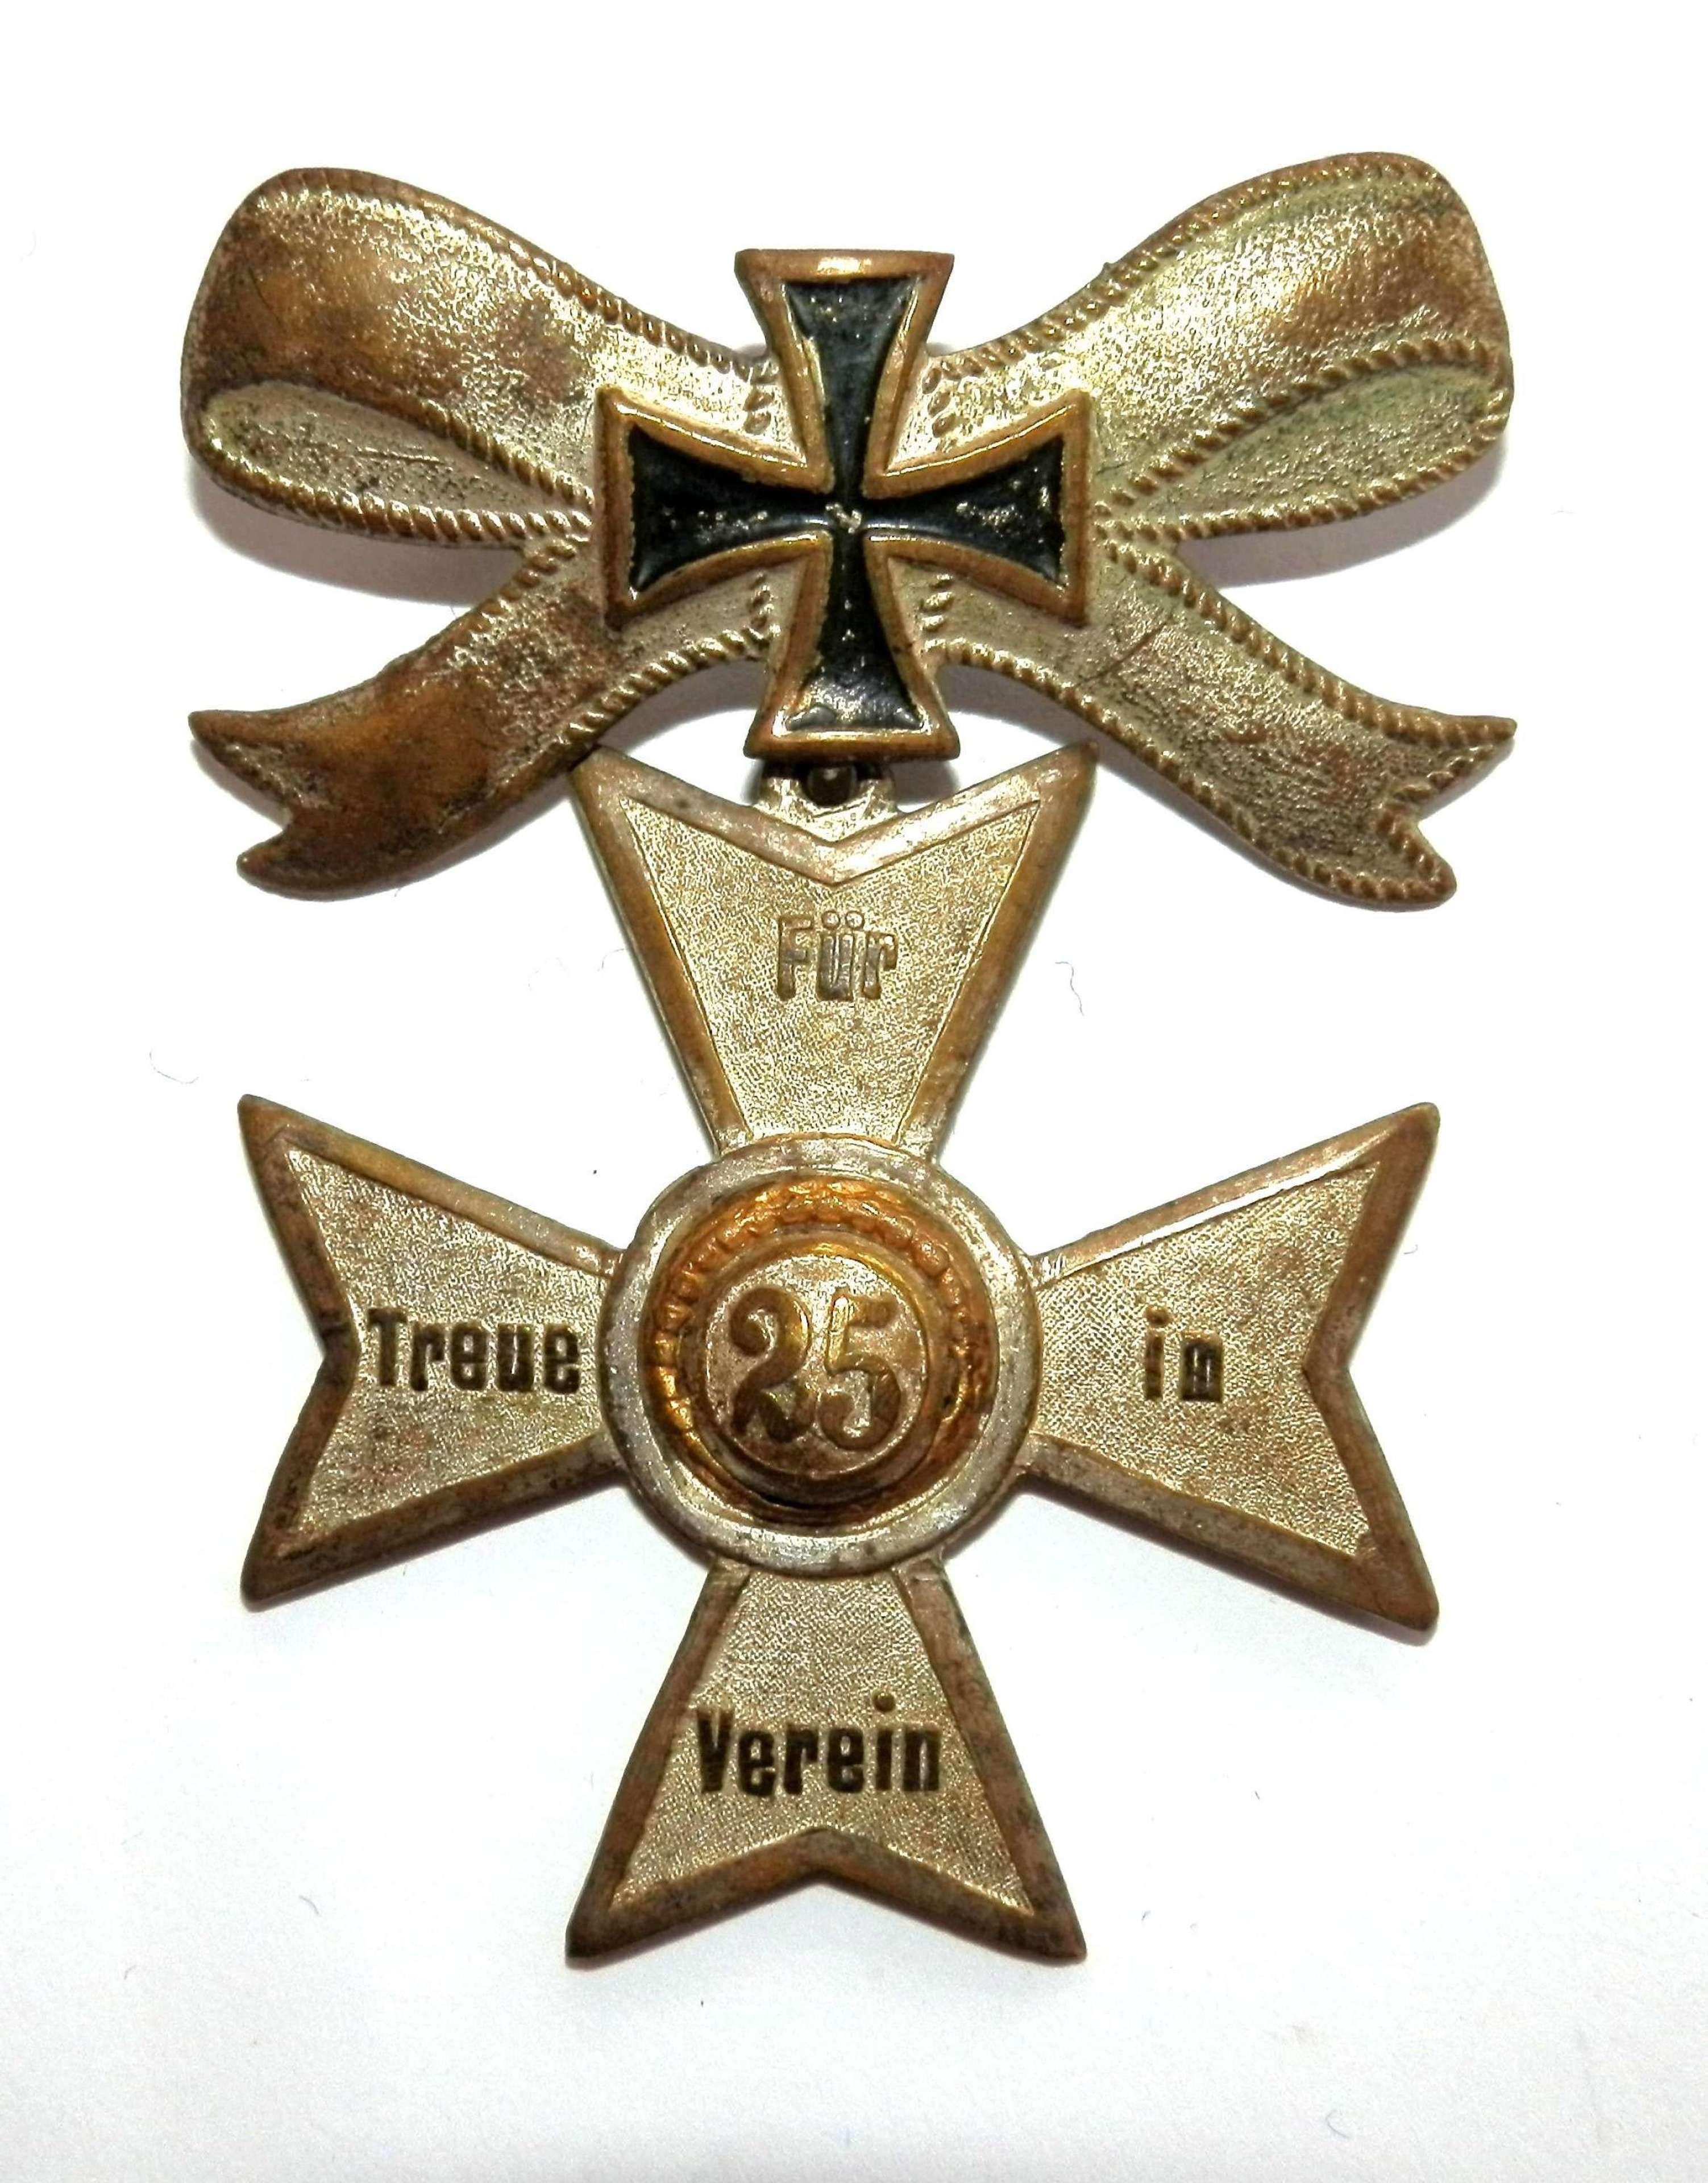 Fur 25 Teue iM Verein '25 years Service Cross'.